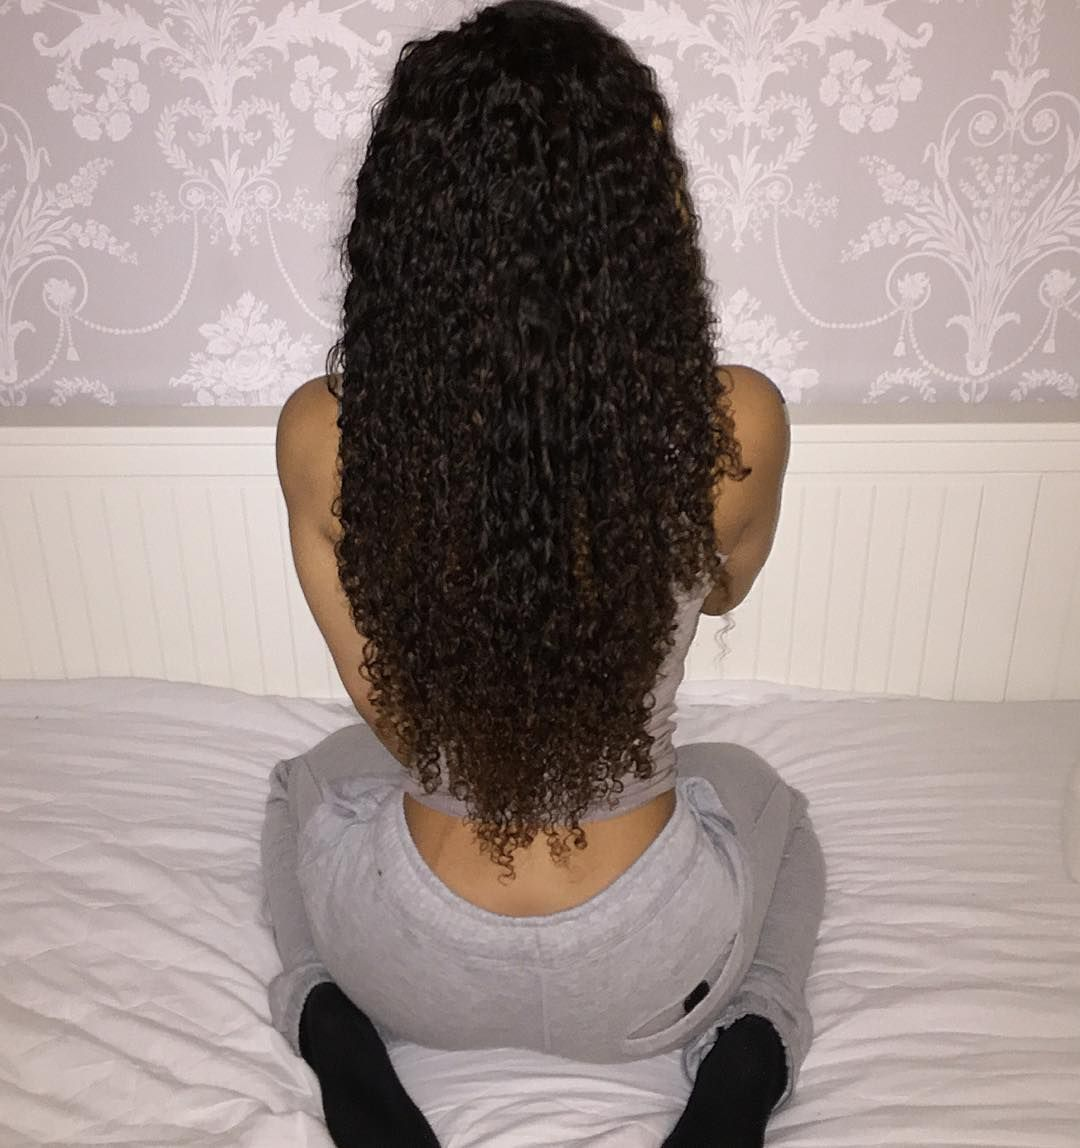 """@diamondvirginhair Got me feeling some typa way,loving my Brazillian Mink Curly hair!"""